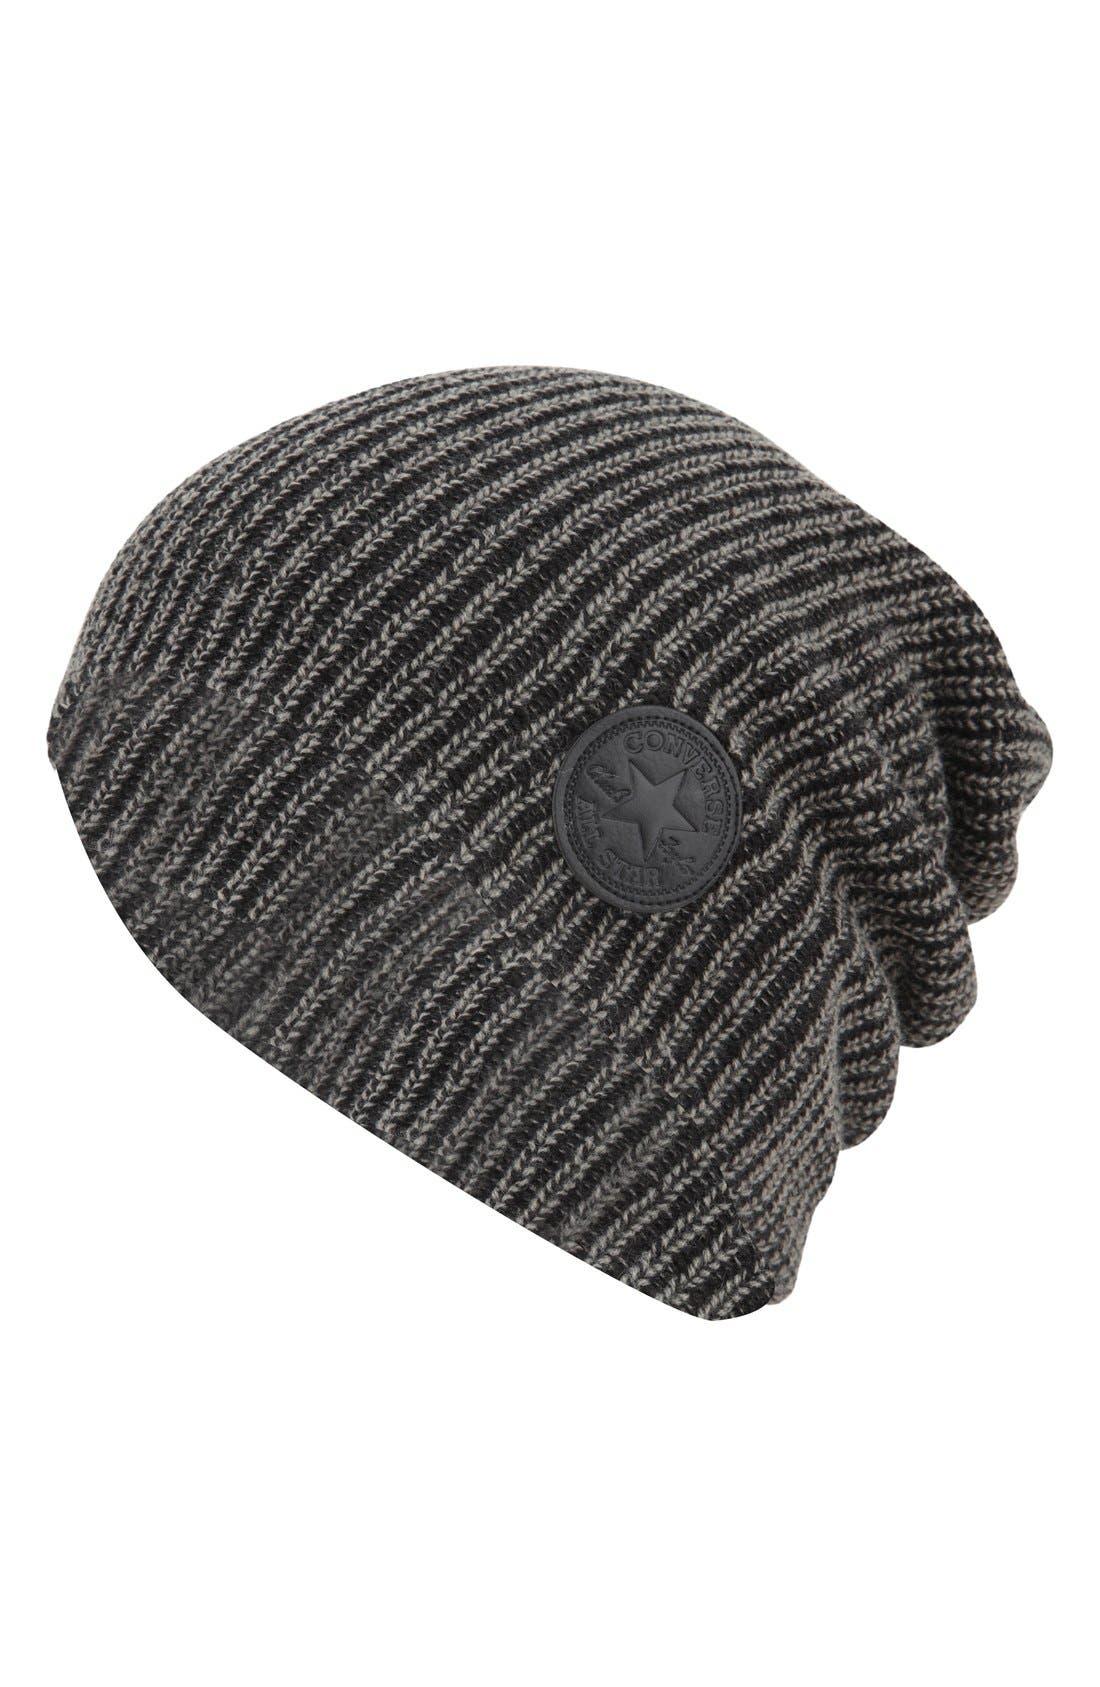 CONVERSE, 'Winter Slouch' Knit Cap, Main thumbnail 1, color, 001